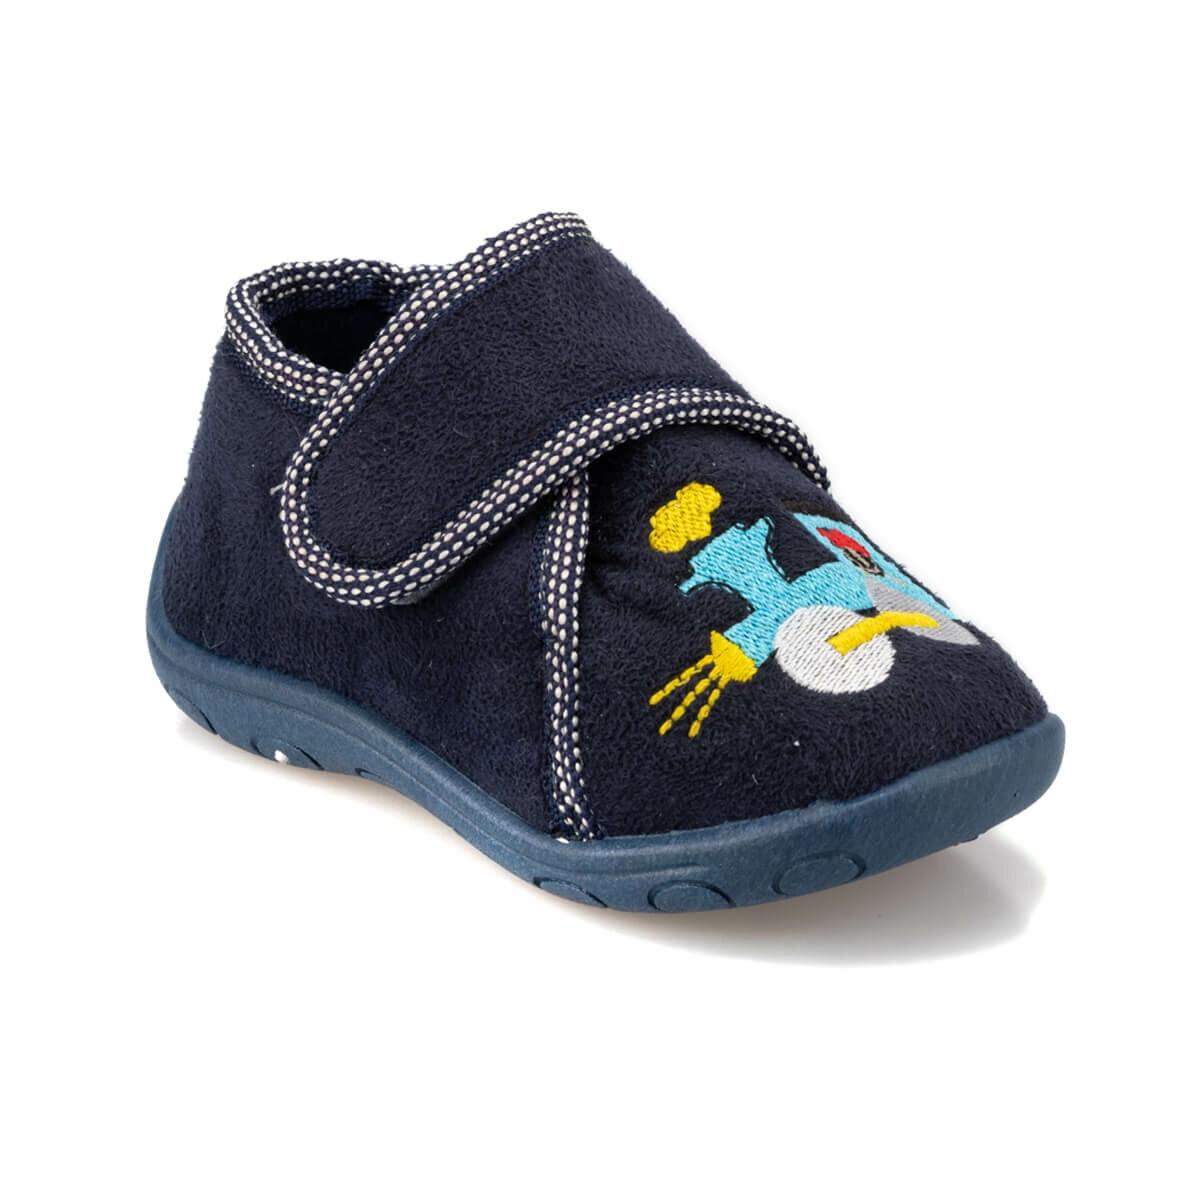 FLO 92.510920.B Navy Blue Male Child Panduf Polaris